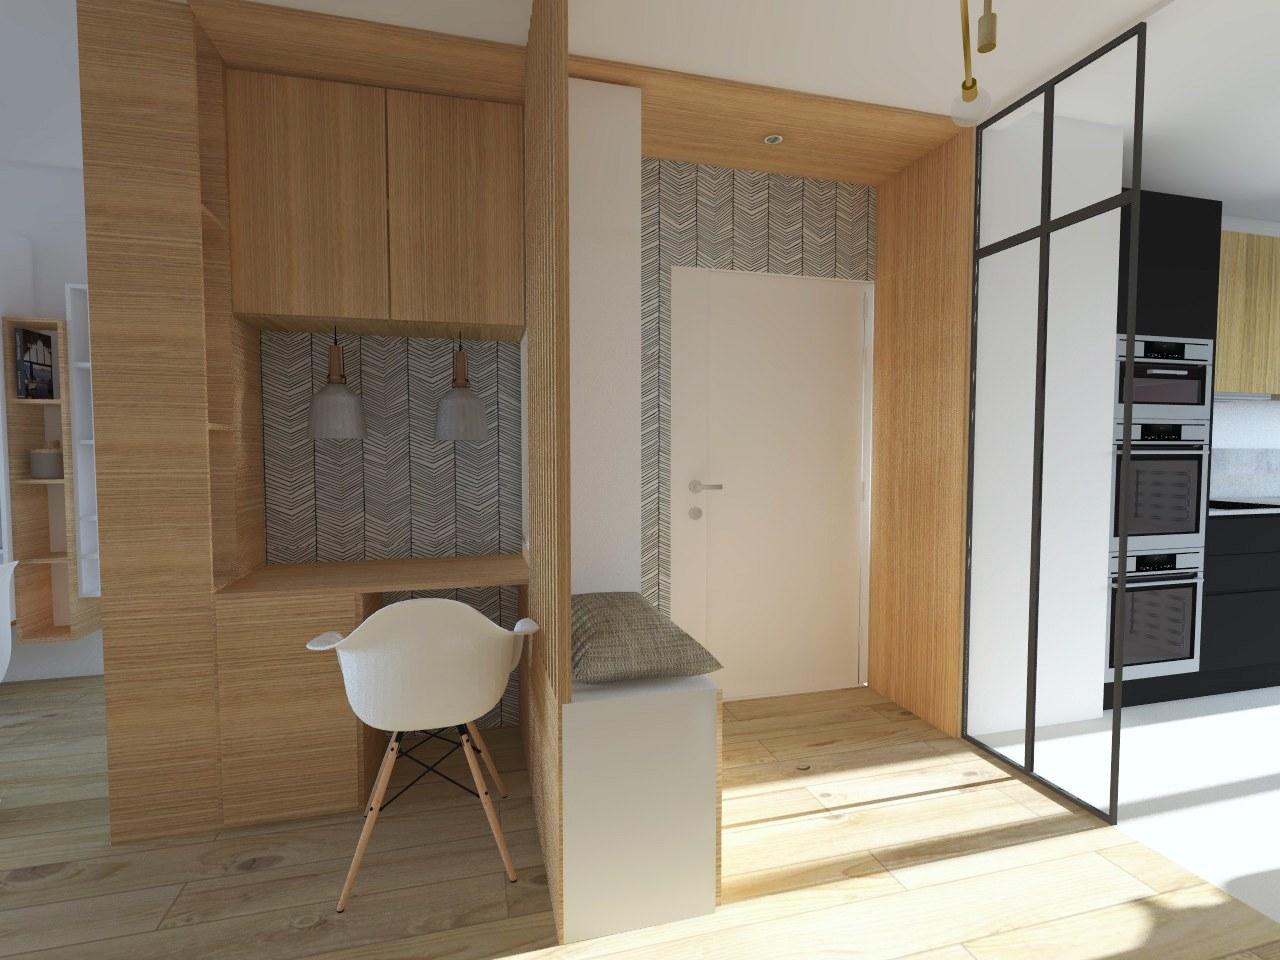 Design d 39 espace appartement nice smaltdesign for Appartement design nice